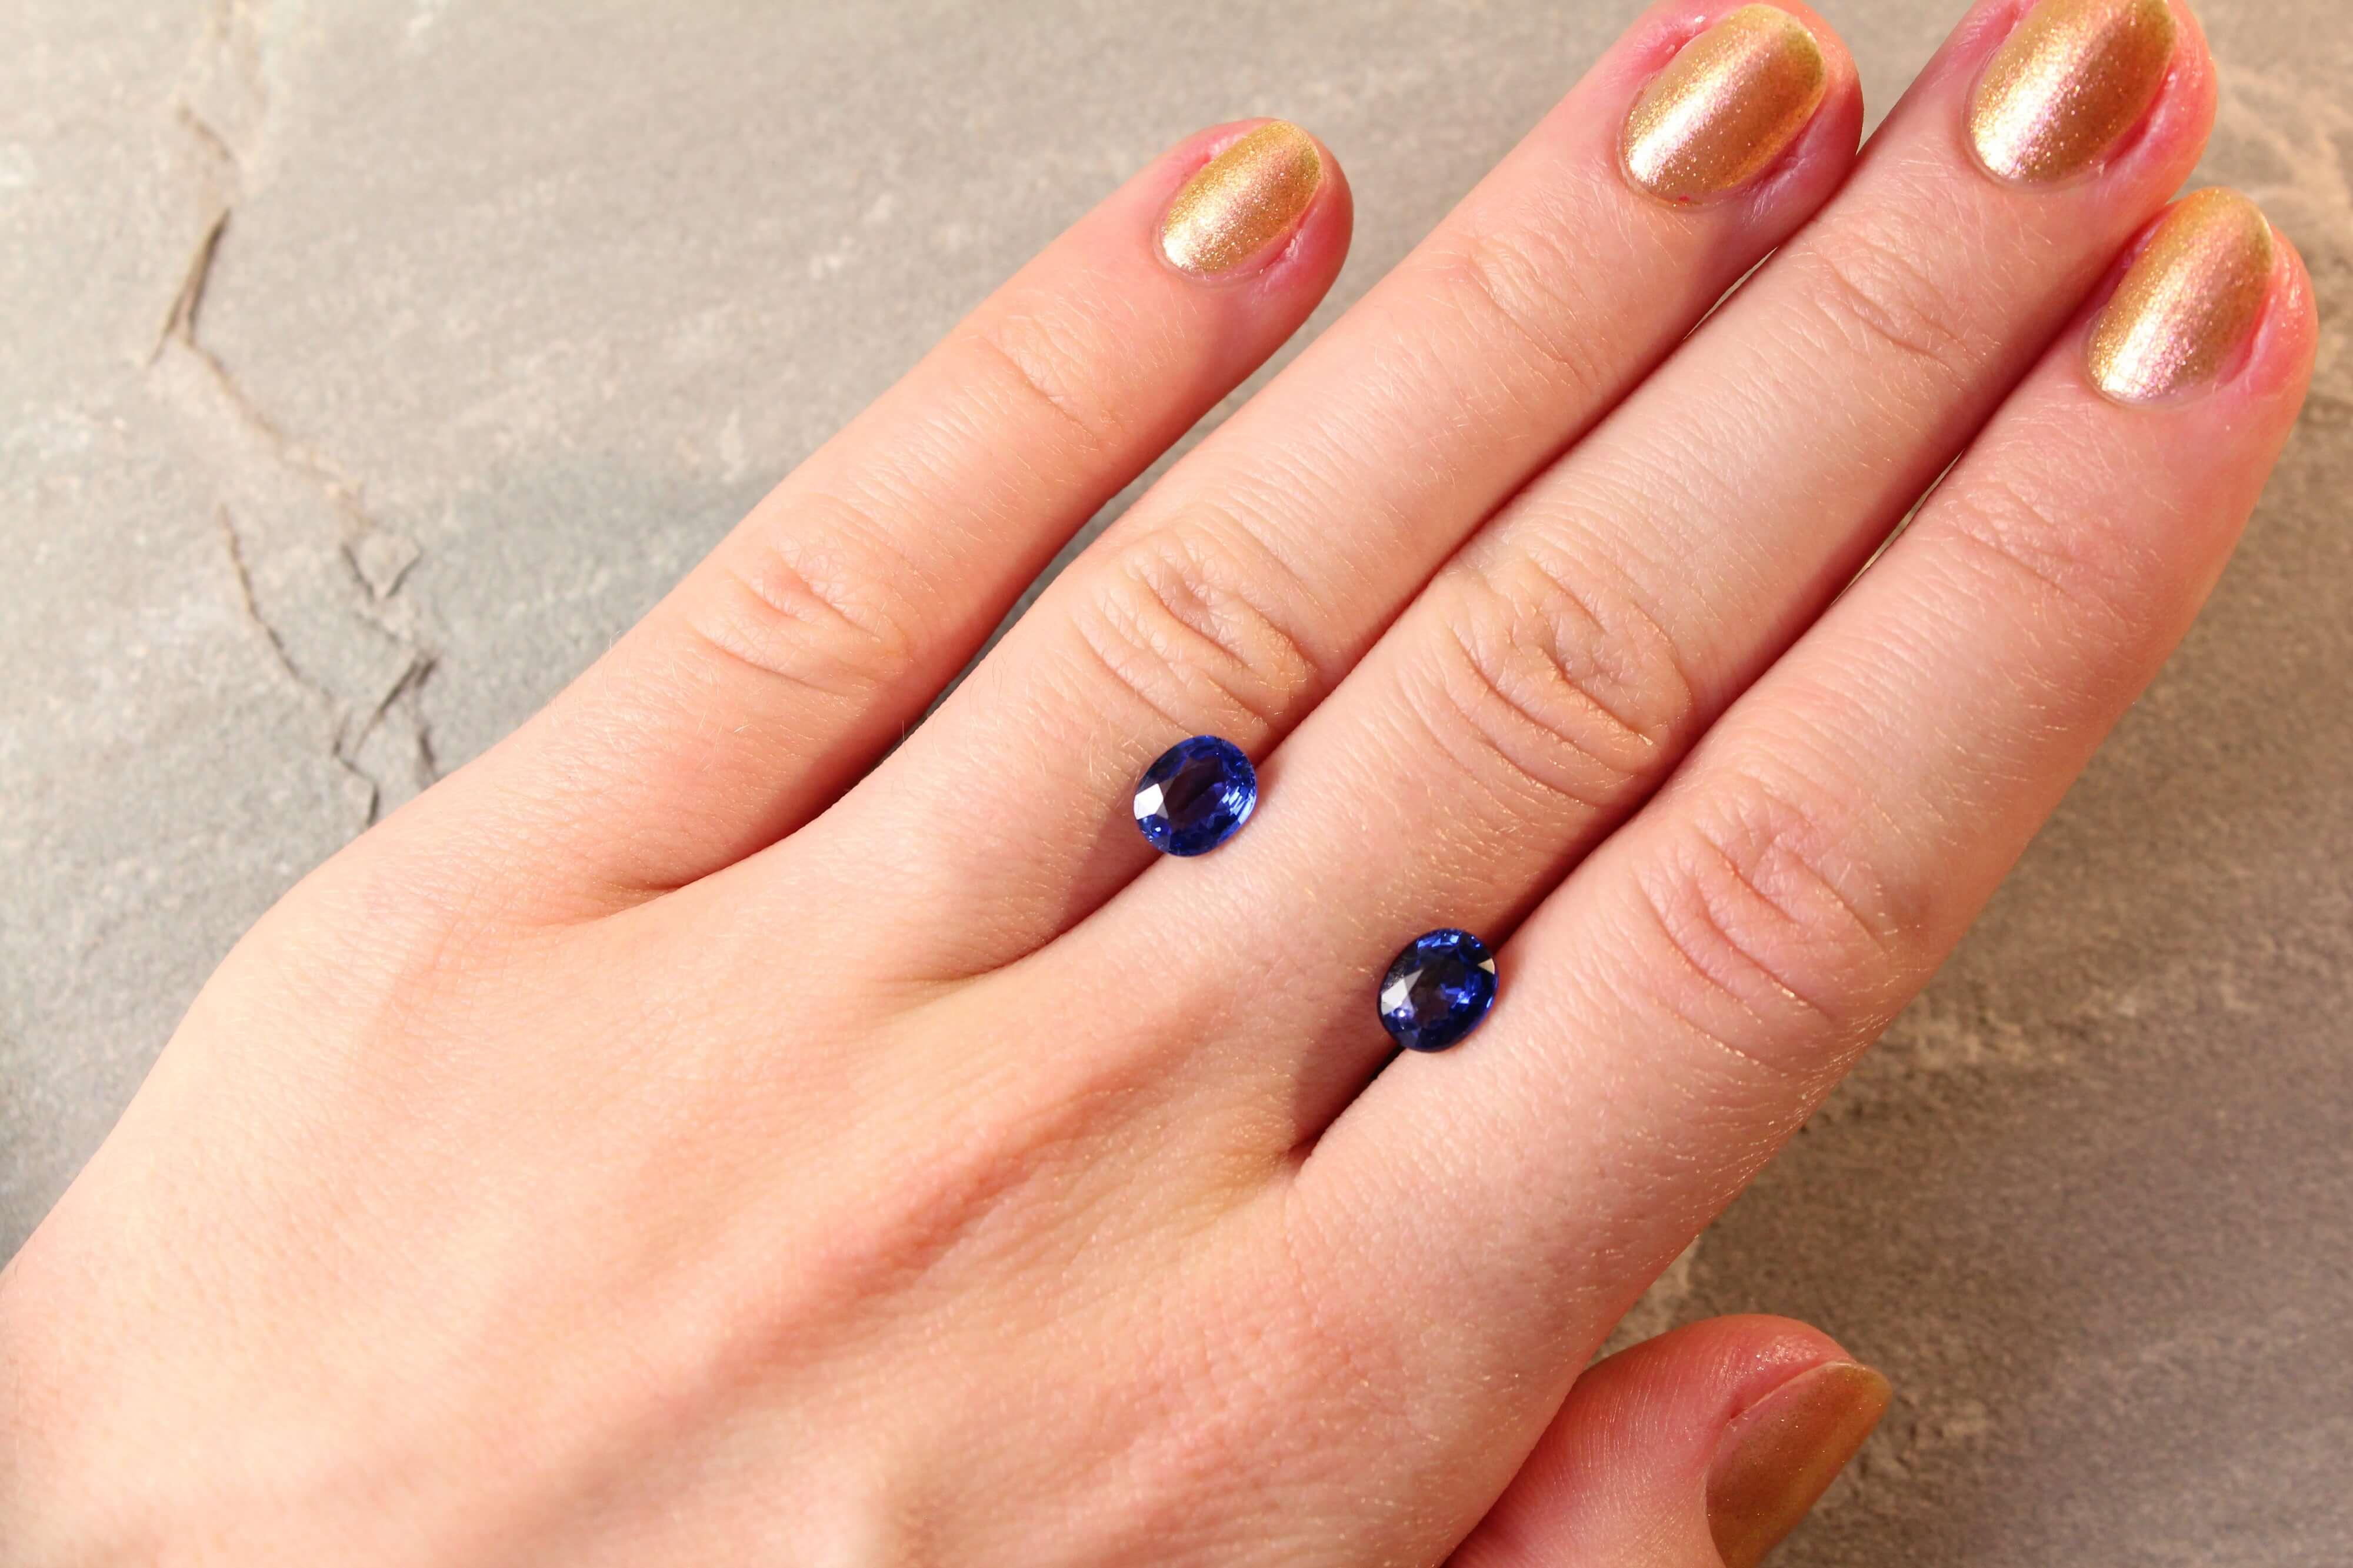 2.67 ct blue oval sapphire pair